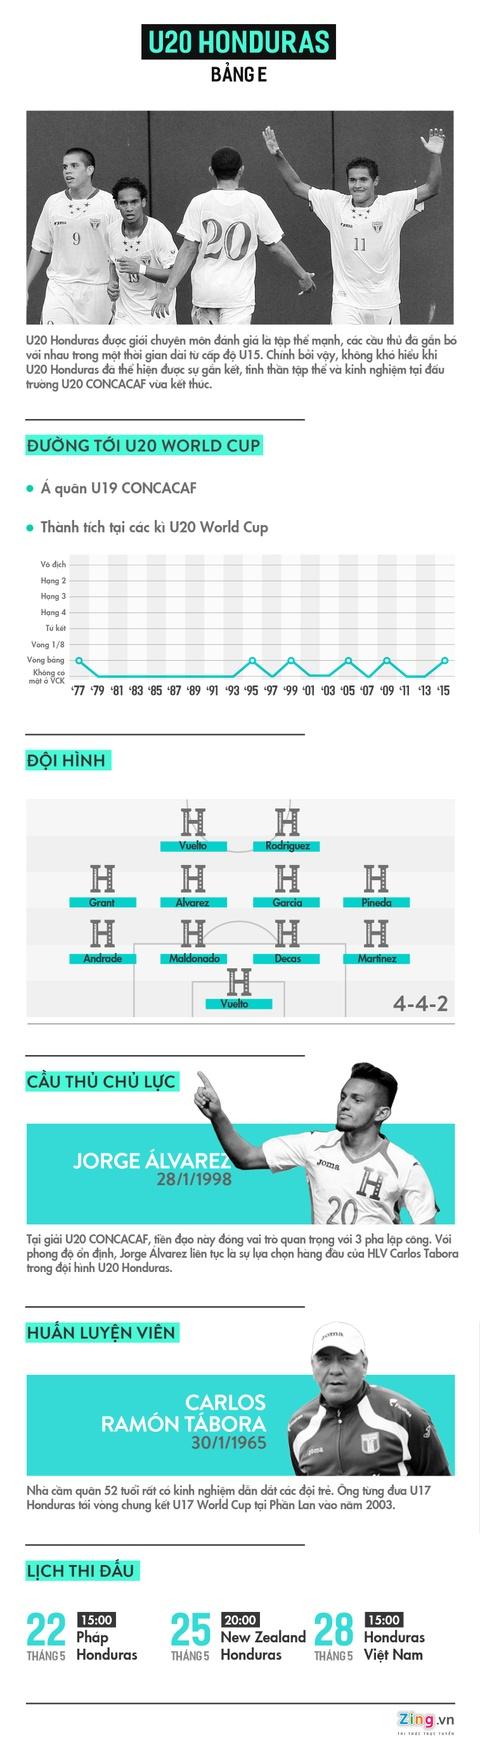 U20 Honduras - doi thu chinh cua U20 Viet Nam lo mat hinh anh 1